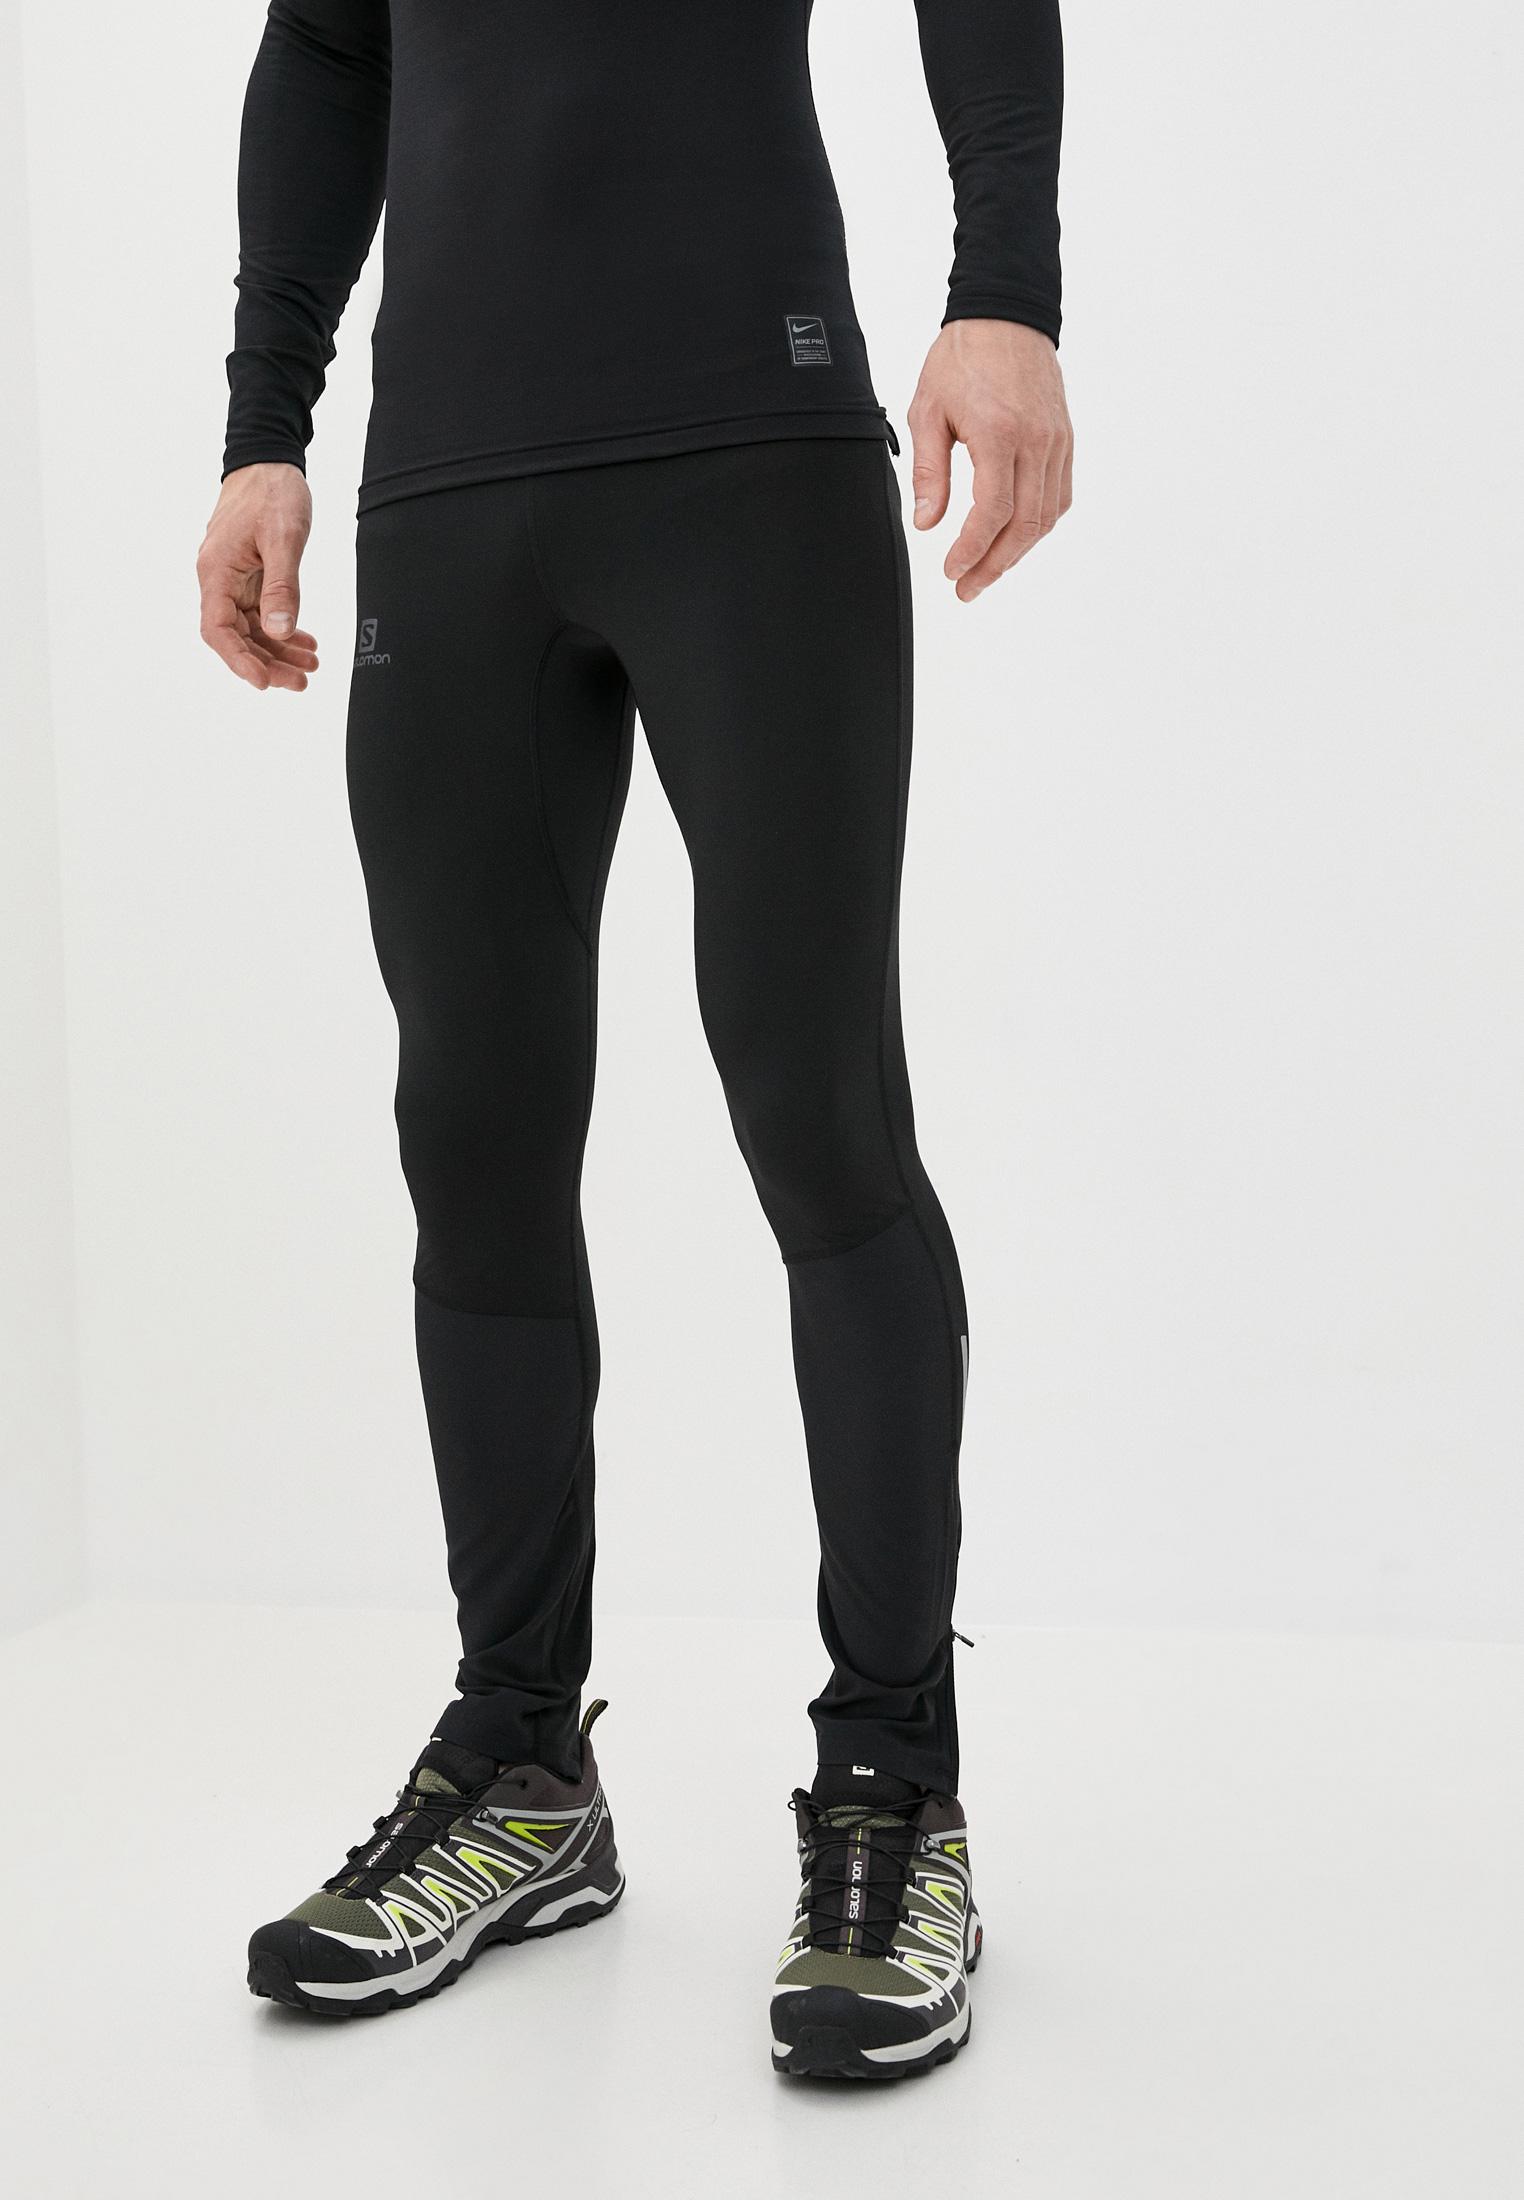 Женские брюки SALOMON (Саломон) L40360300